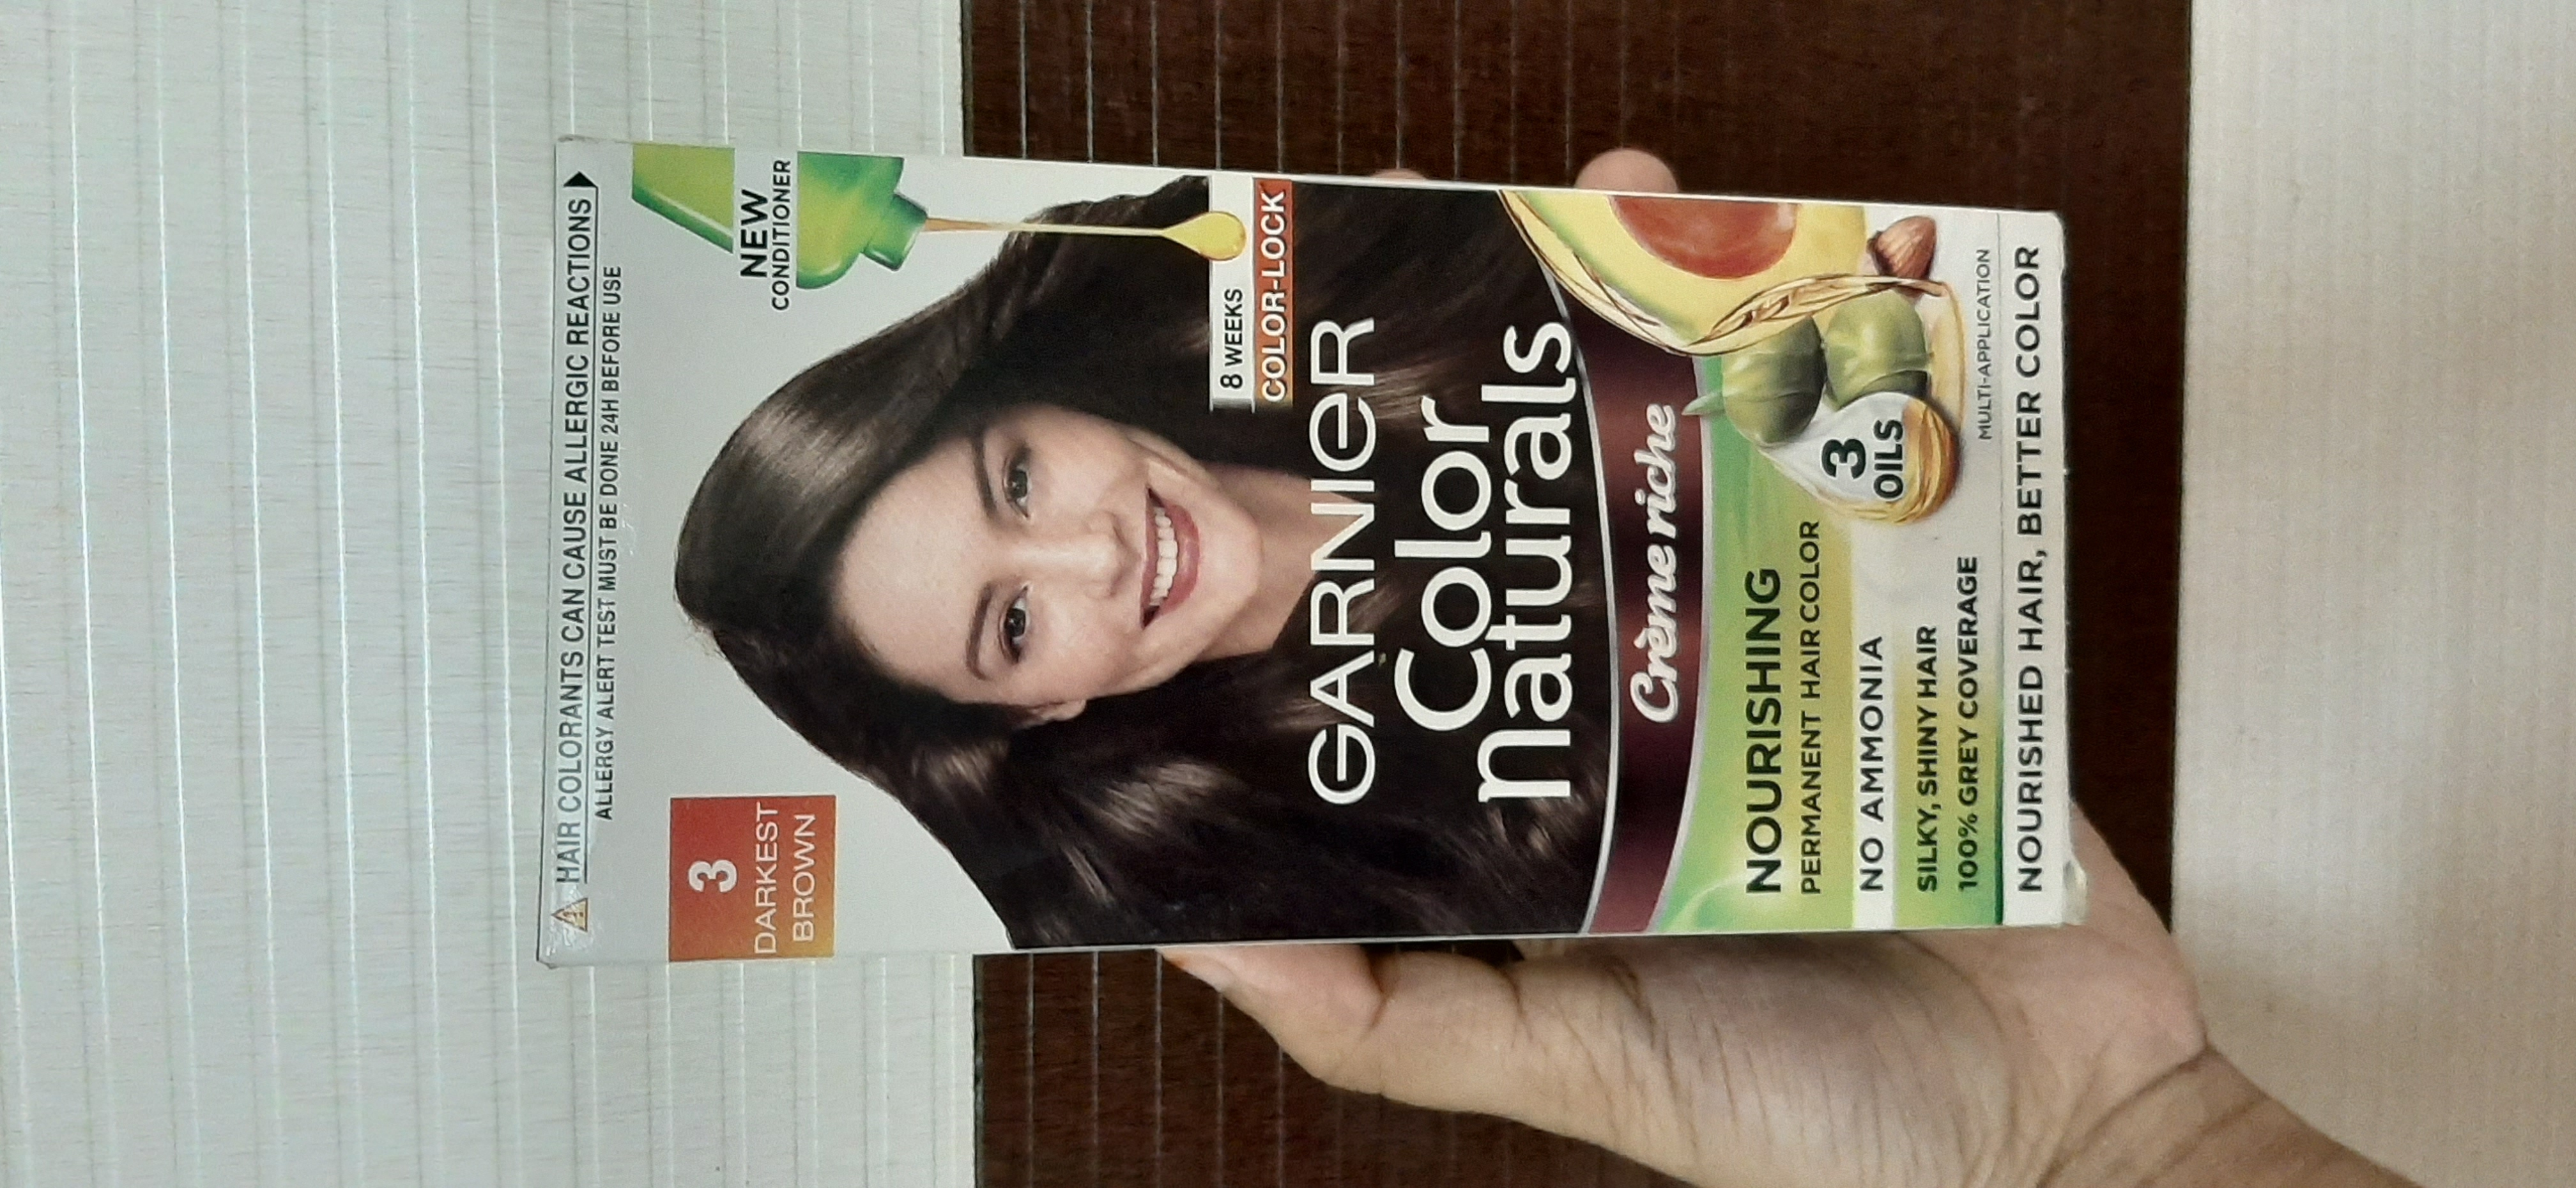 Garnier Color Naturals Creme Hair Color-Good product-By samira_haider-9